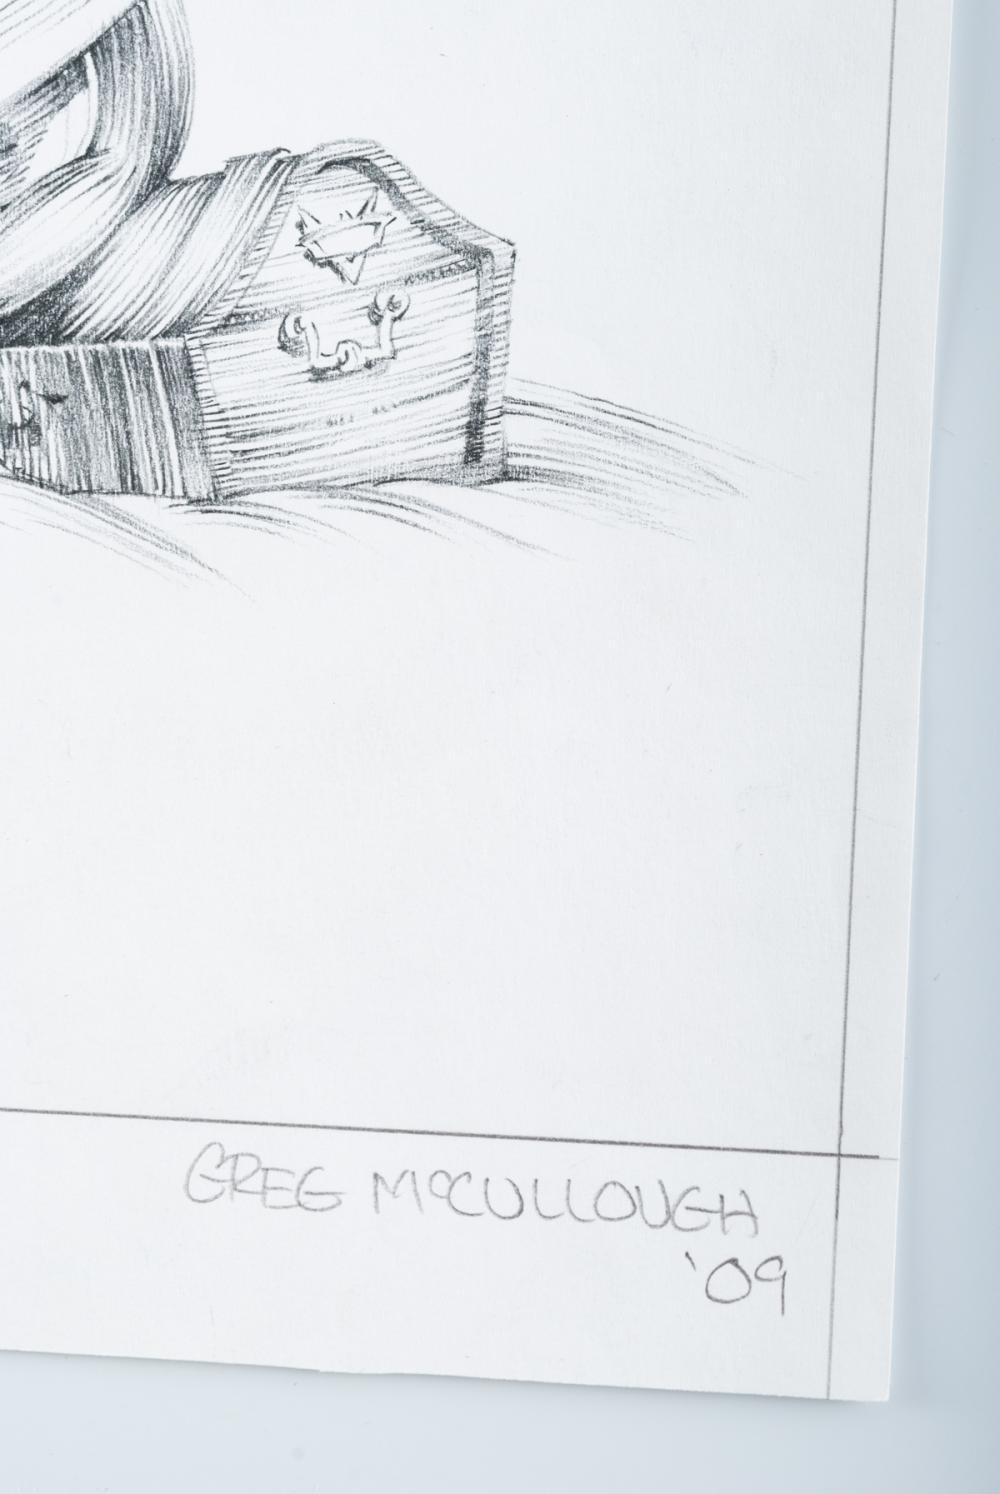 Greg McCullough